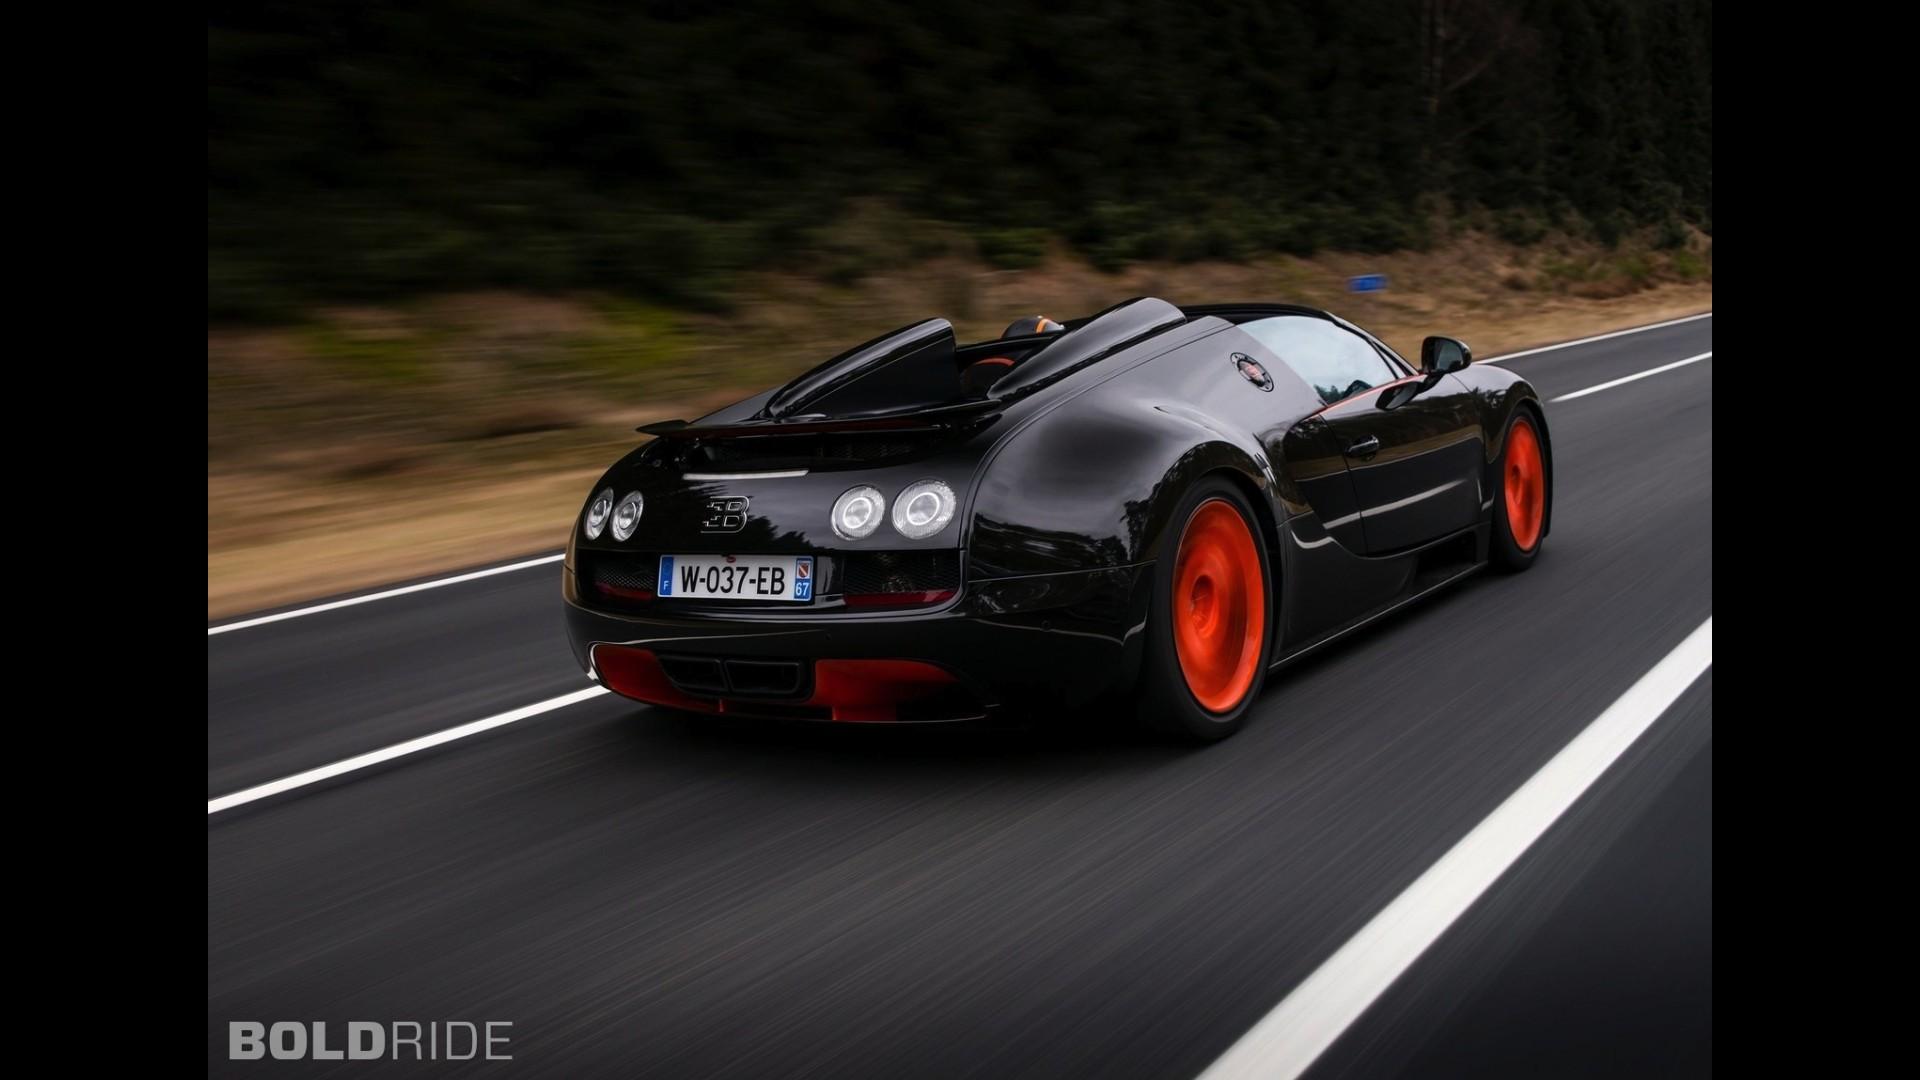 bugatti-veyron-16-4-grand-sport-vitesse-world-record-car Stunning Bugatti Veyron 16.4 Grand Sport Vitesse Interior Cars Trend